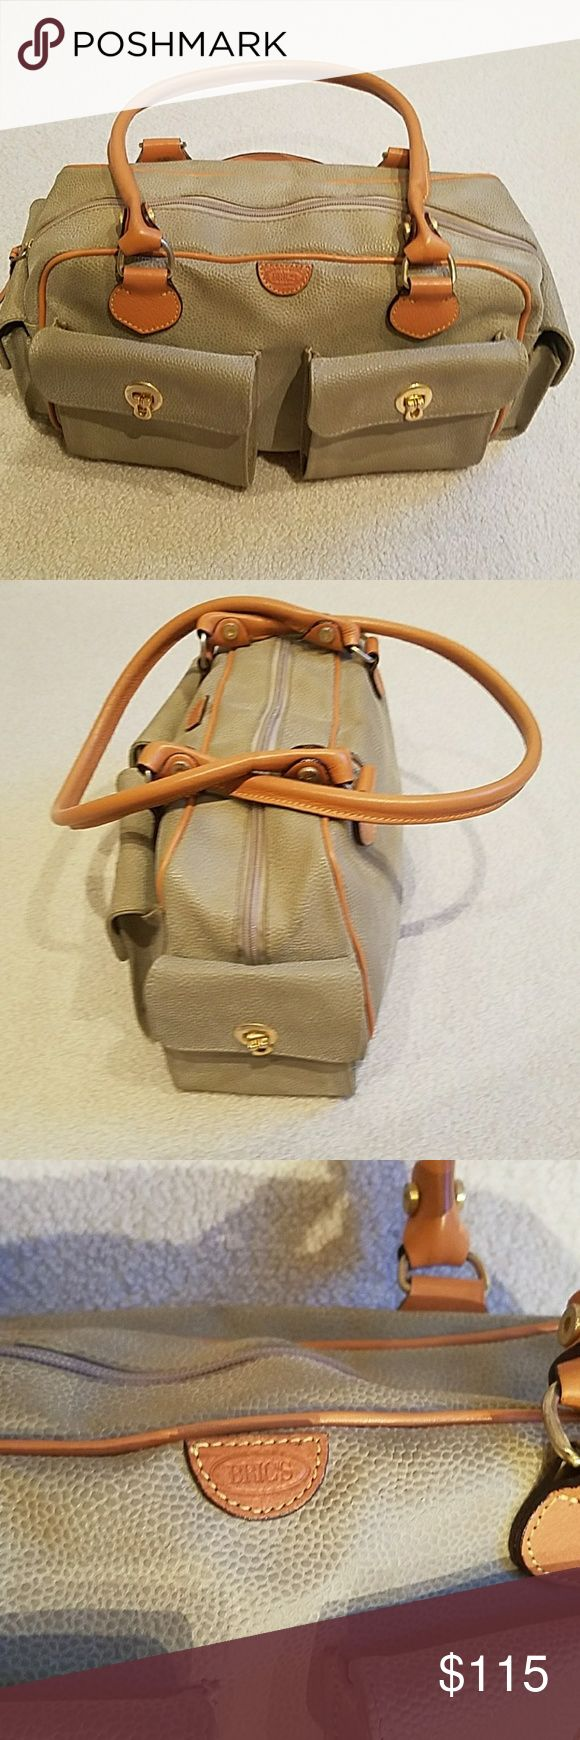 Bric's handbag Camel and tan pebble leather handbag brics Bags Shoulder Bags